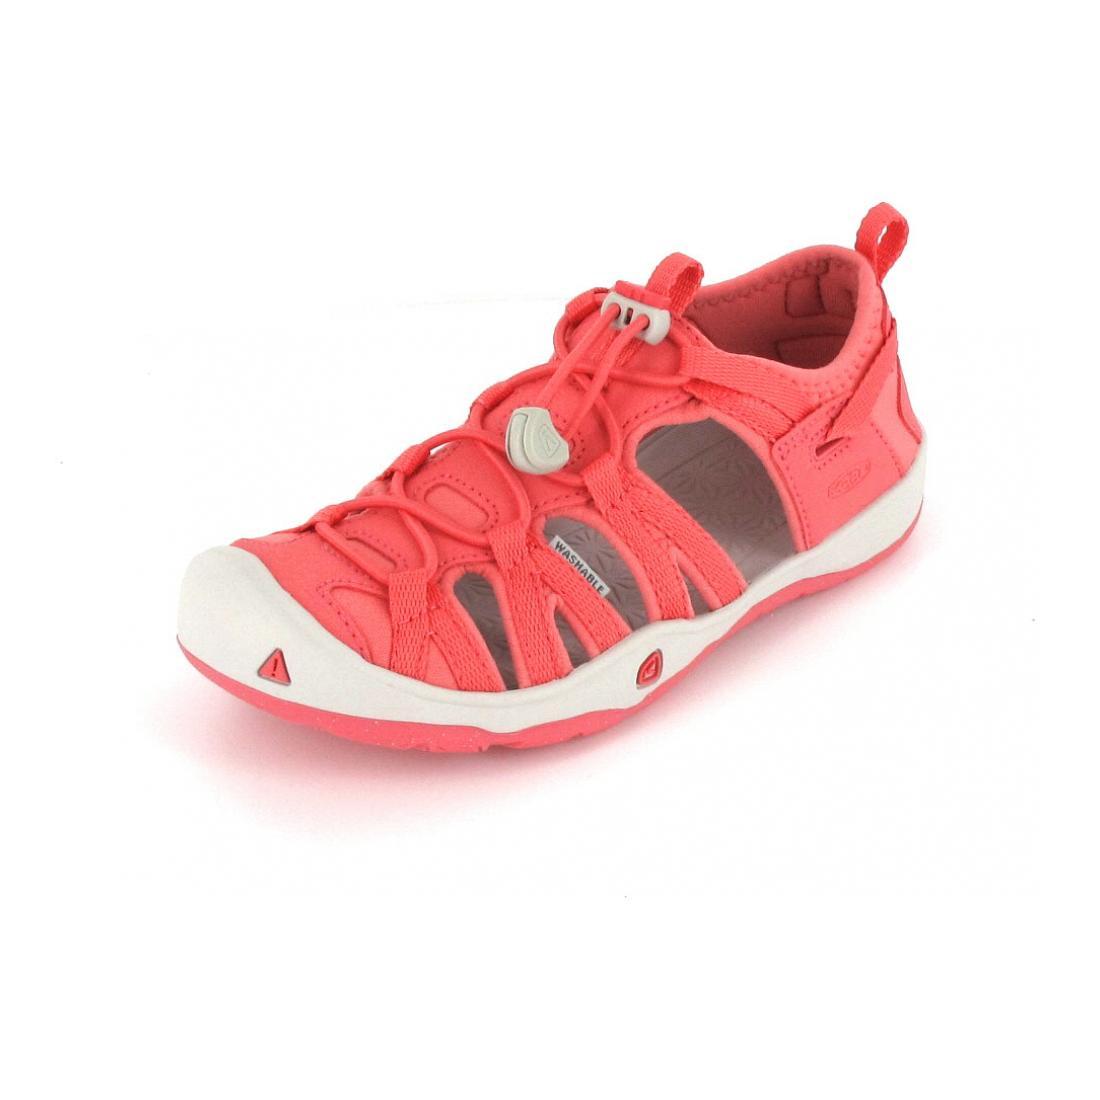 KEEN Sandale Moxie Sandal Y